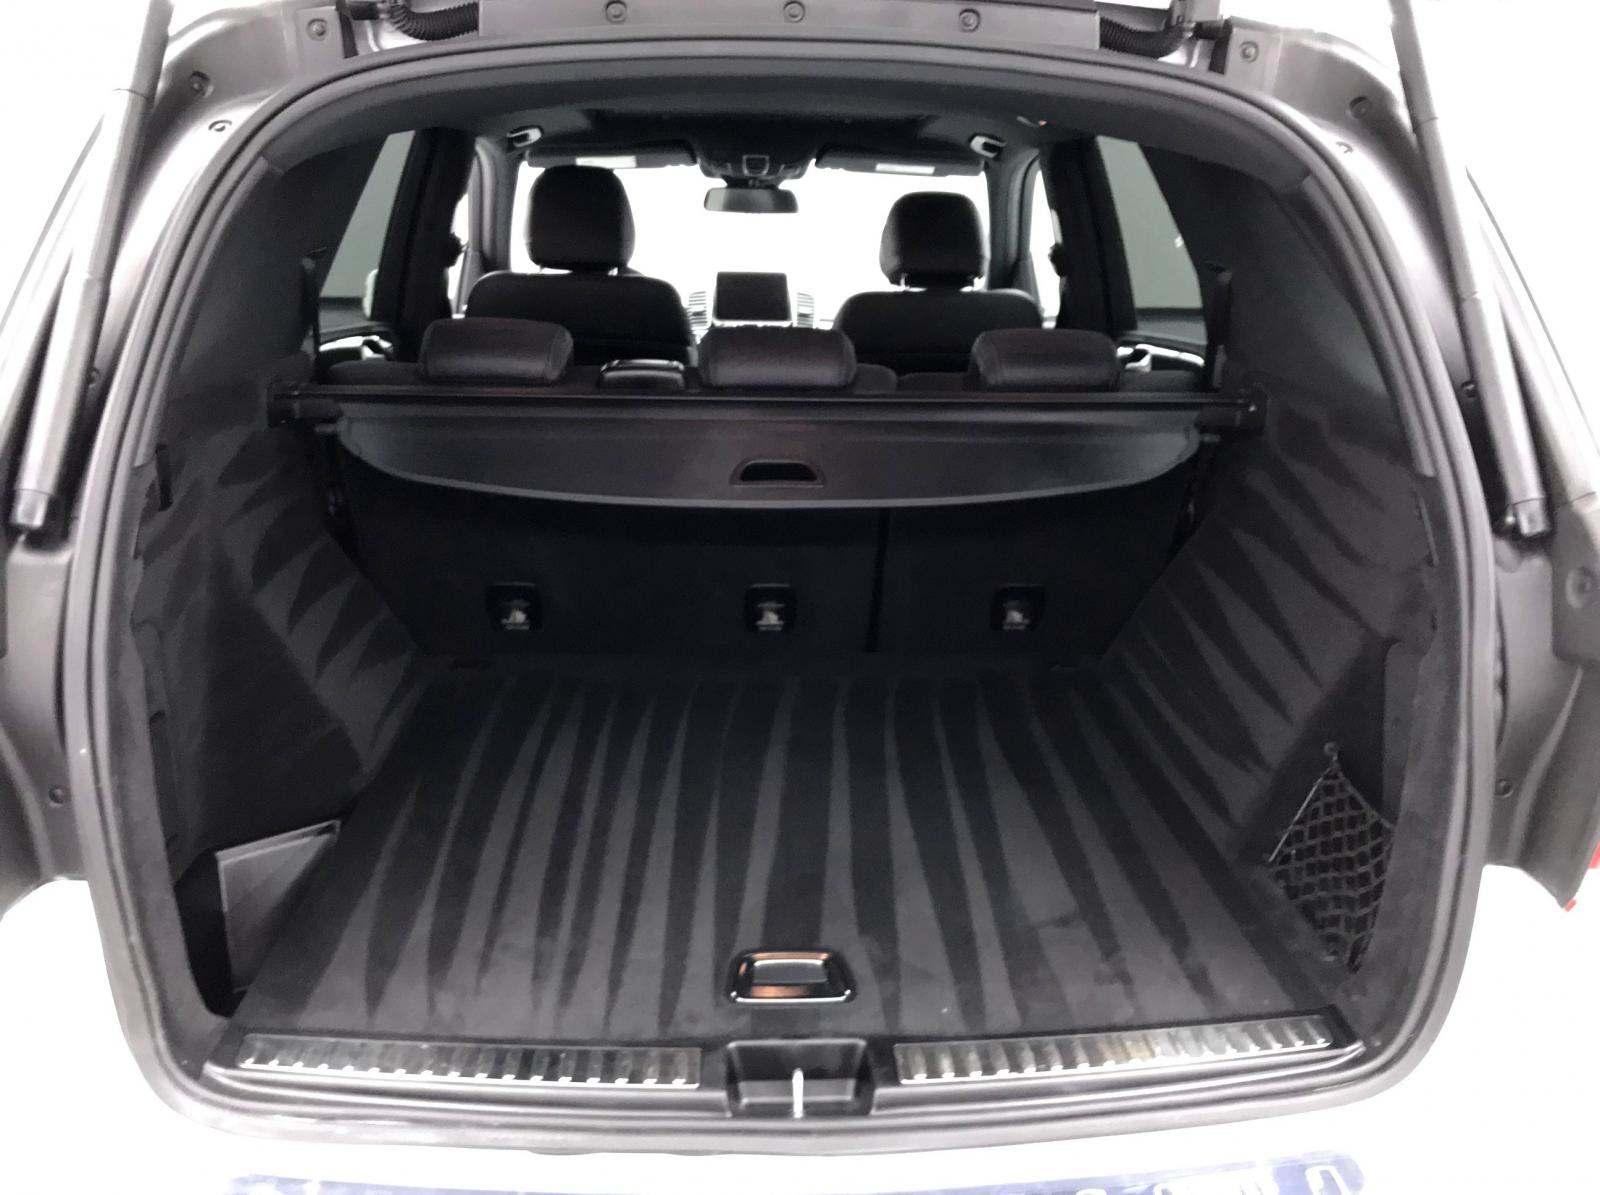 used Mercedes-Benz GLE-Class 2018 vin: 4JGDA5HB3JB125514